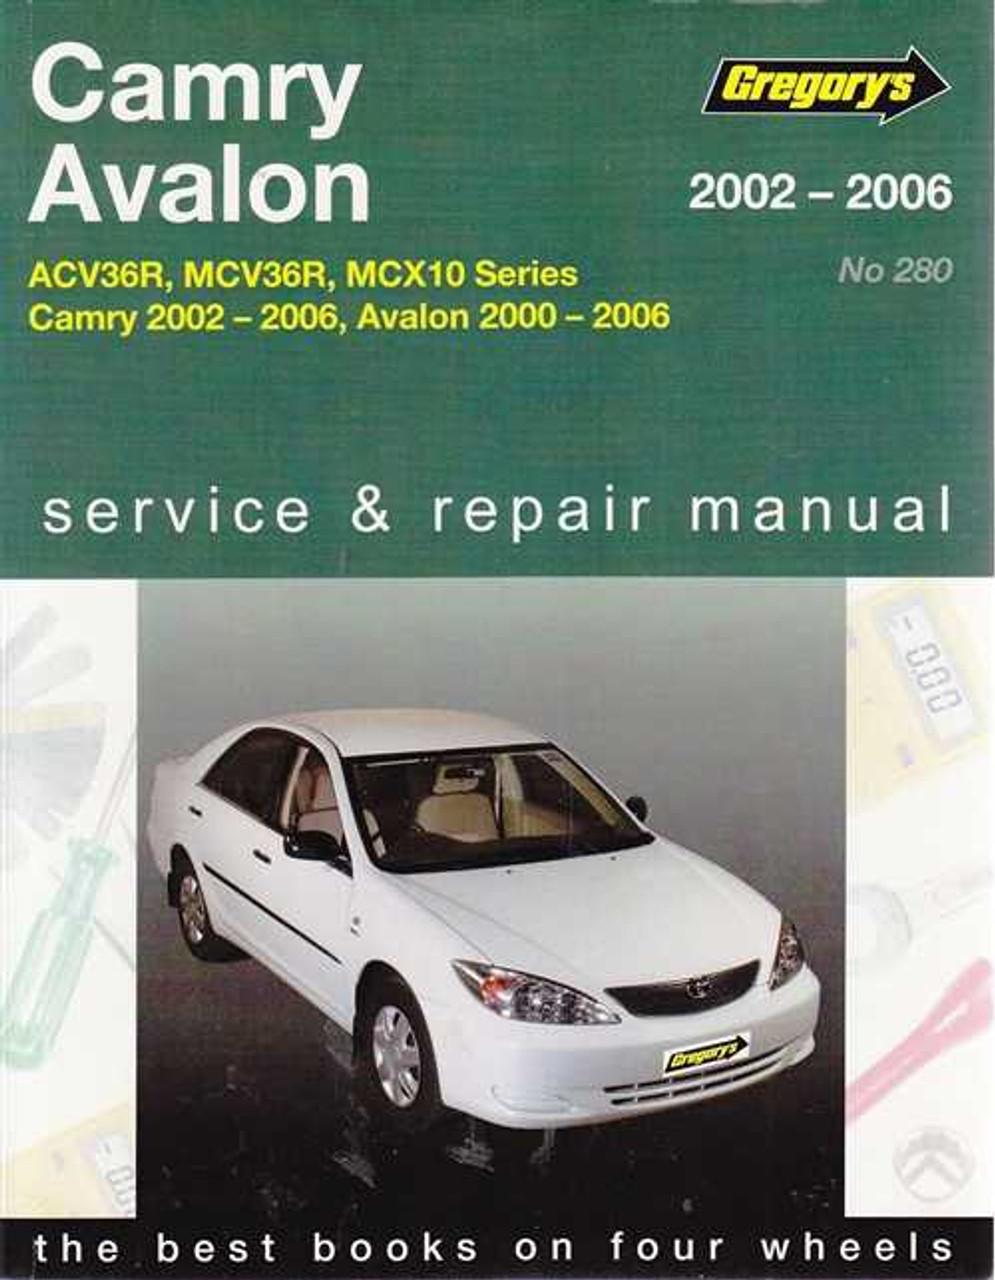 toyota camry avalon acv36r mcv36r mcx10 series 2000 2006 rh automotobookshop com au 2002 Toyota Camry Le owners manual toyota camry 2002